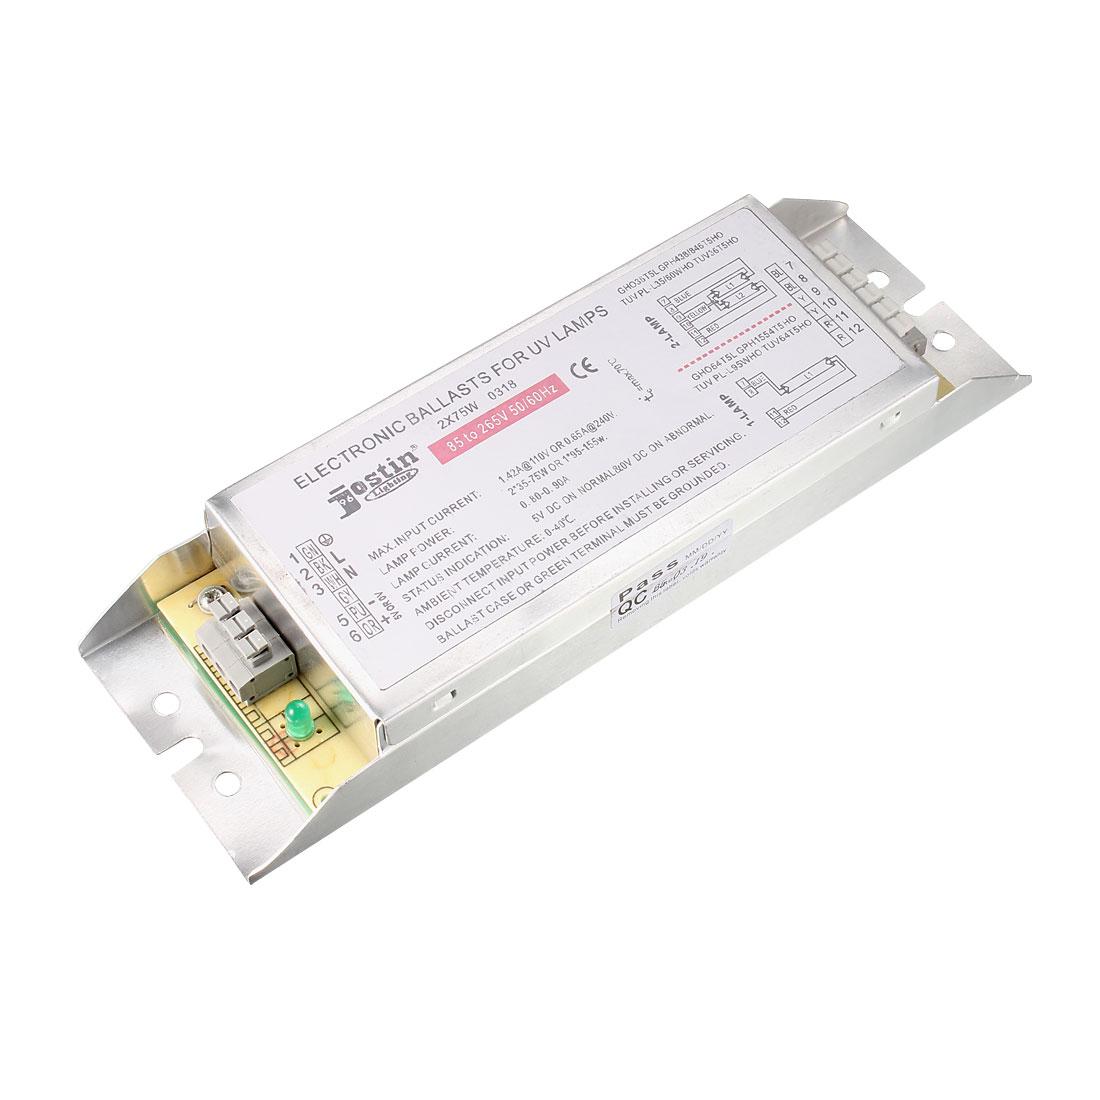 Electronic Ballast 85/265-Volt 150Watt Fluorescent Lamp Ballasts